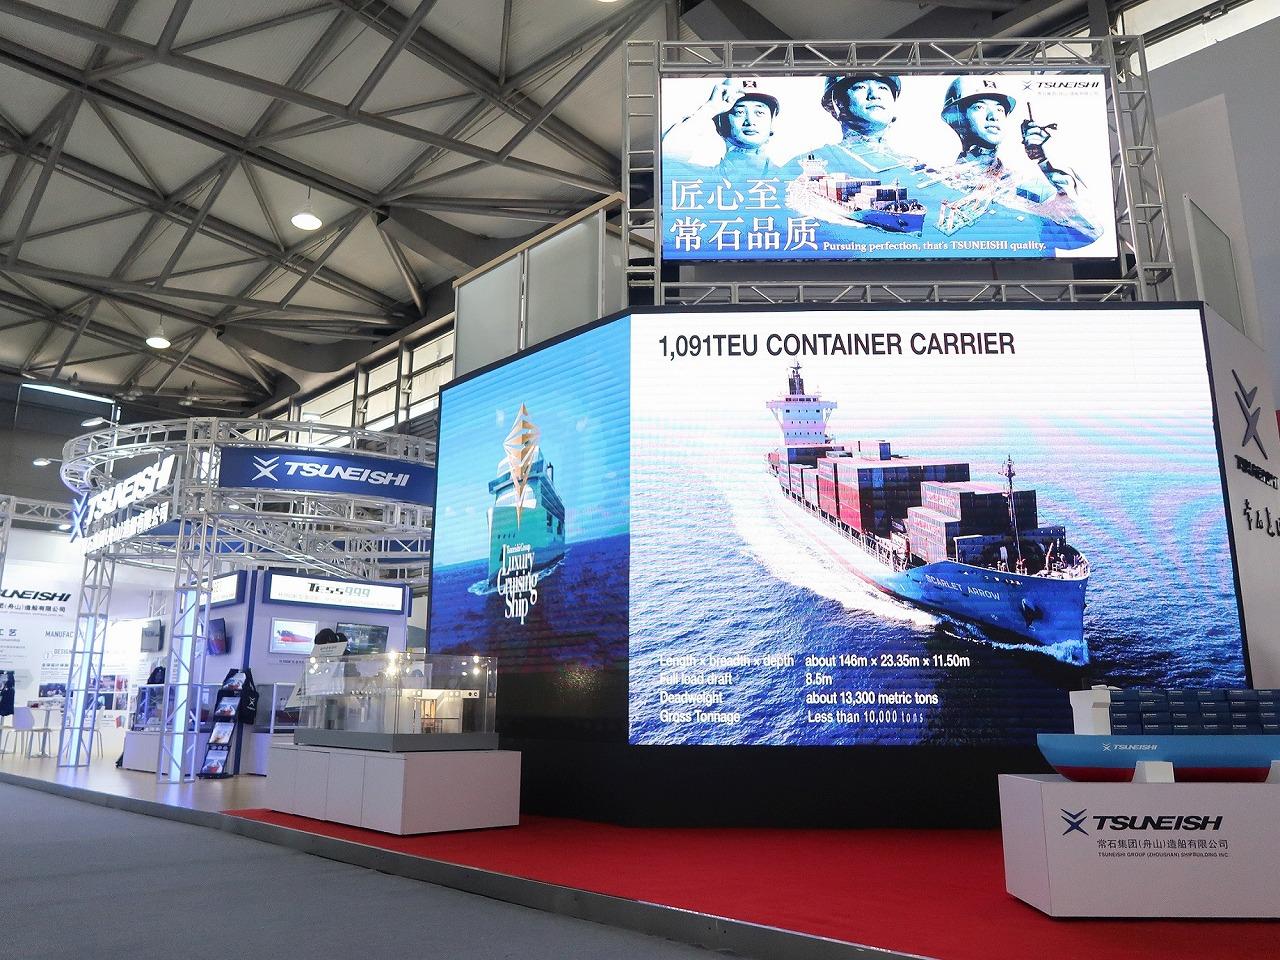 TSUNEISHI GROUP (ZHOUSHAN) SHIPBUILDING exhibited at MARINTEC CHINA 2019, one of Asia's largest international maritime exhibitions